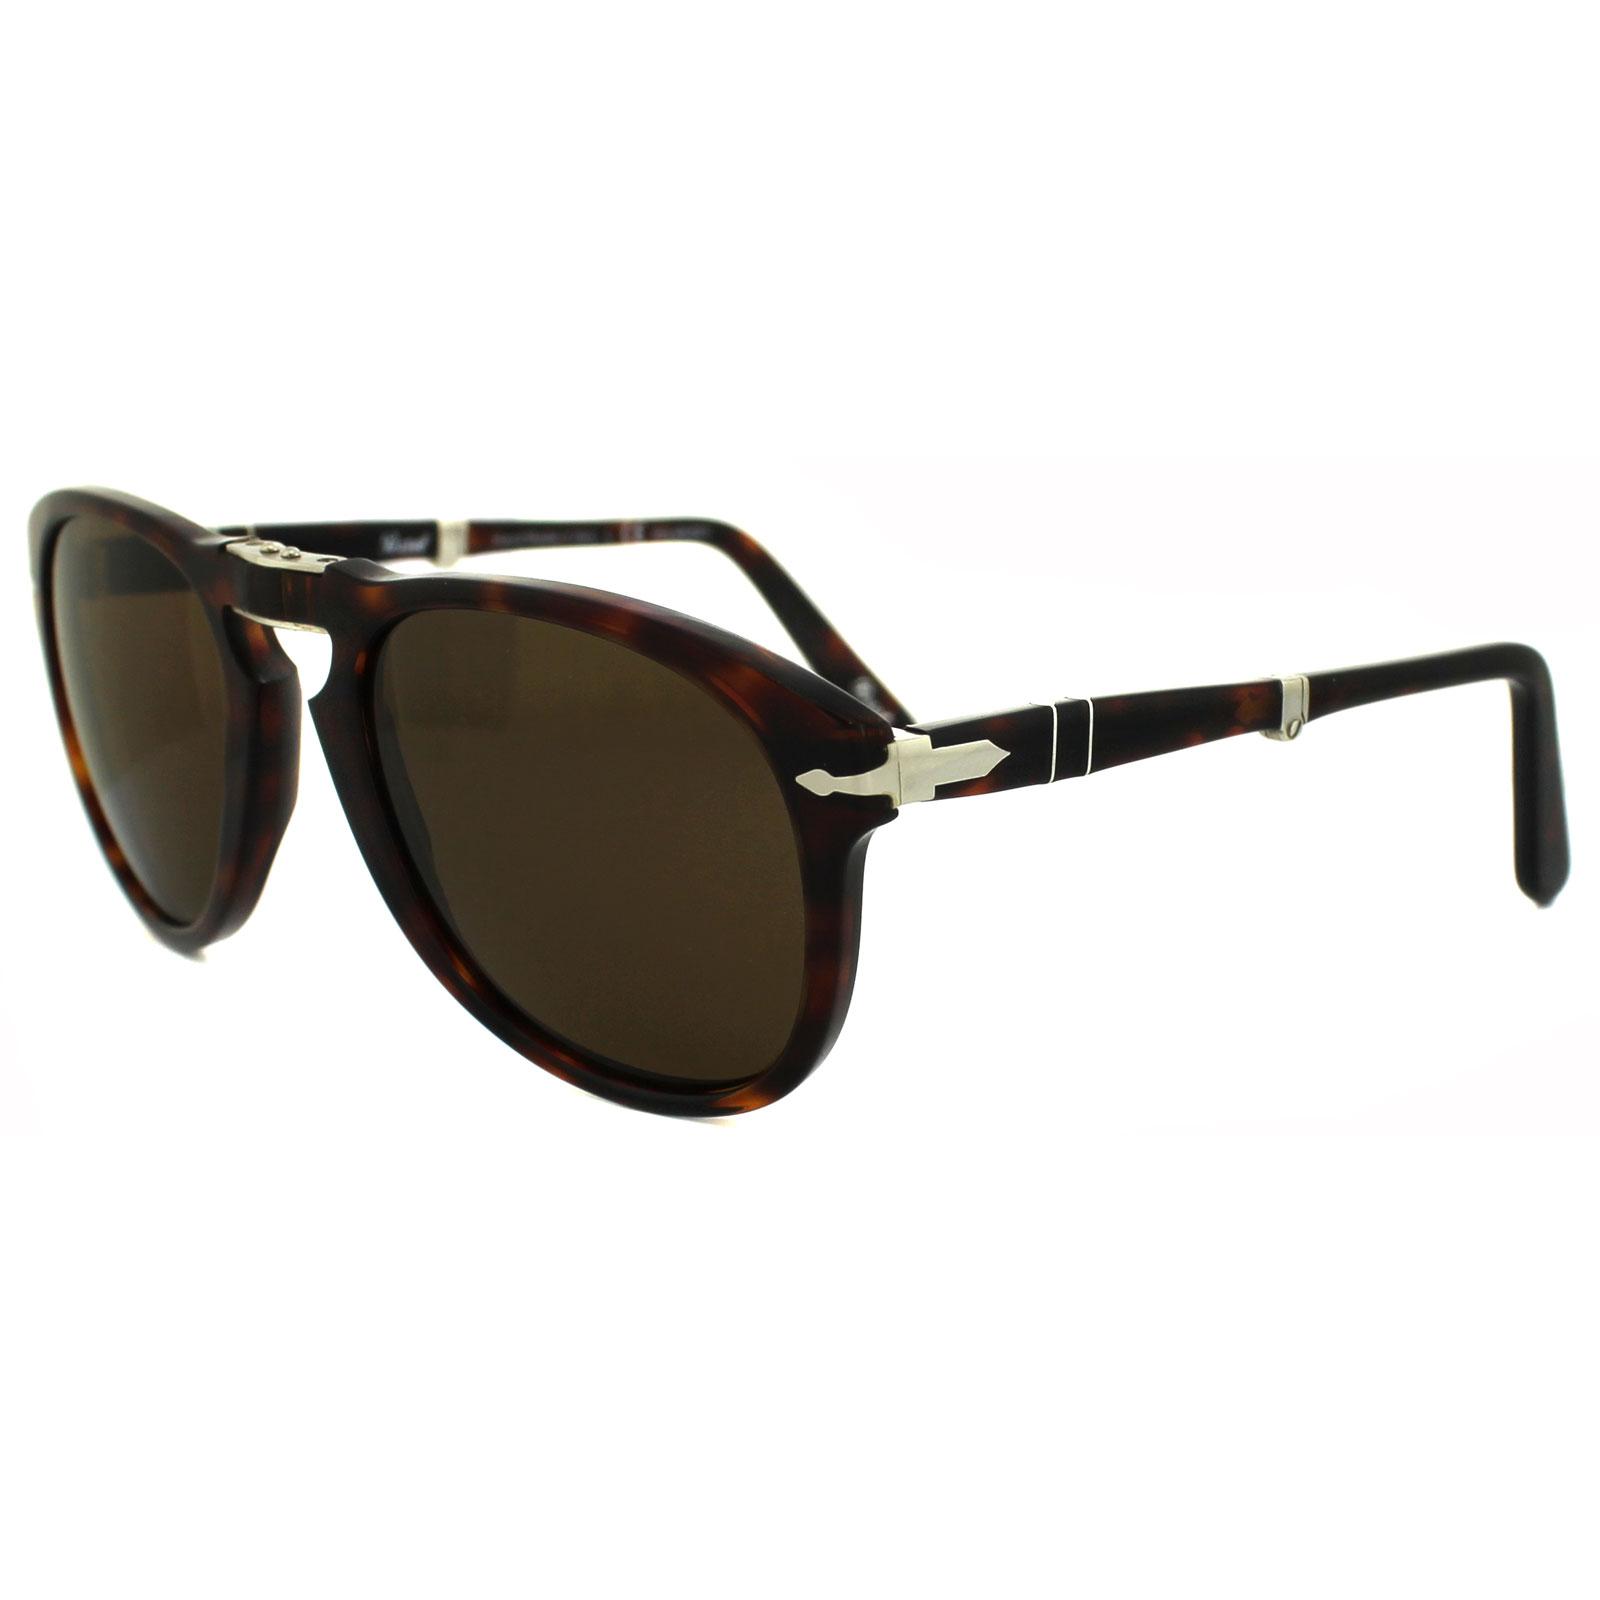 f9de226bd5 Sentinel Persol Sunglasses 714 24 57 Havana Brown Polarized Folding Steve  McQueen 54mm